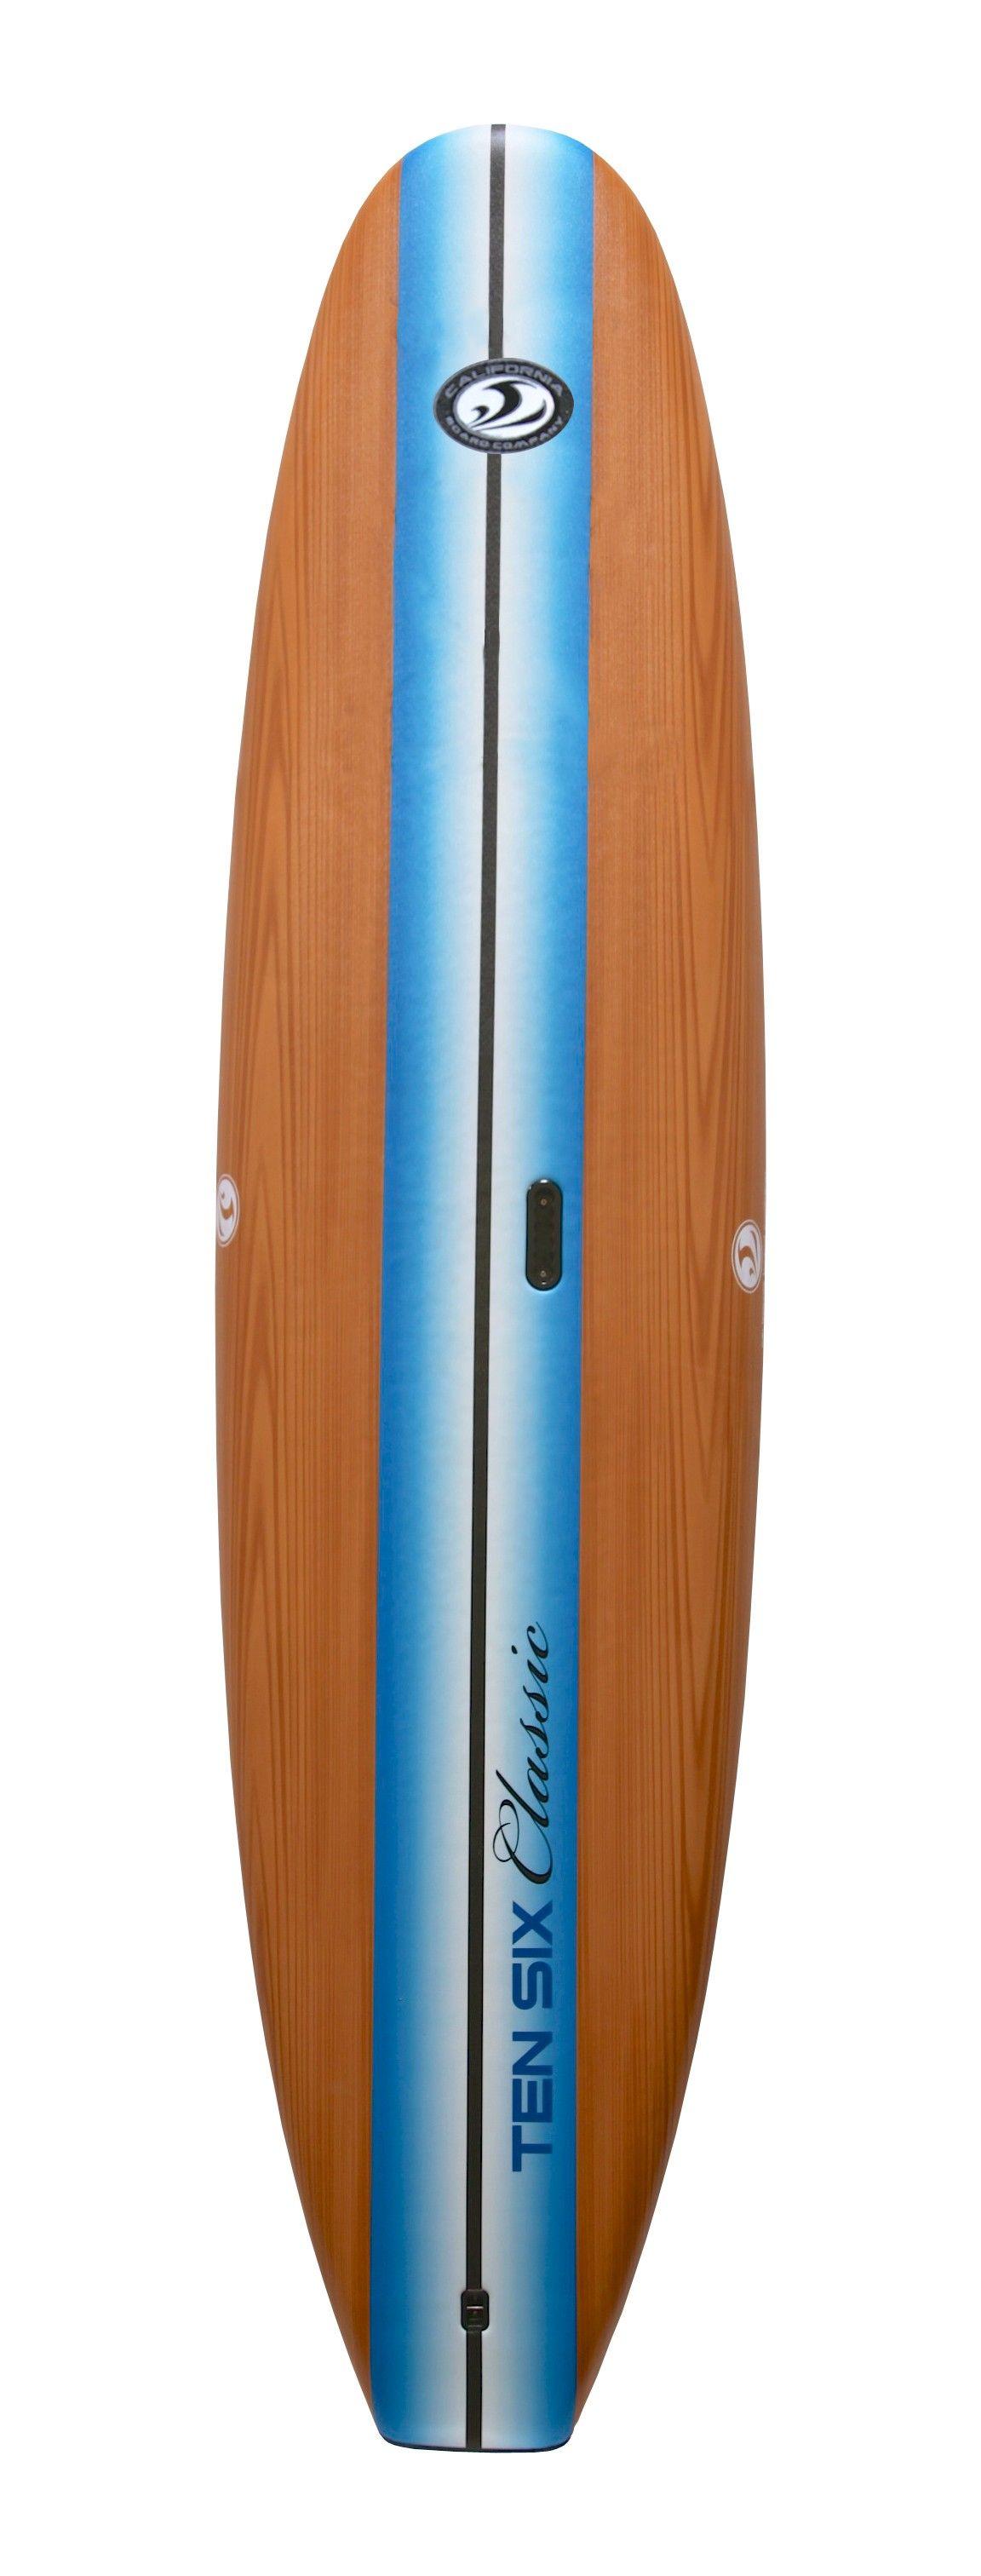 California Board Company 10 Six Soft Stand Up Paddleboard Package Standup Paddle Best Stand Up Paddle Boarding